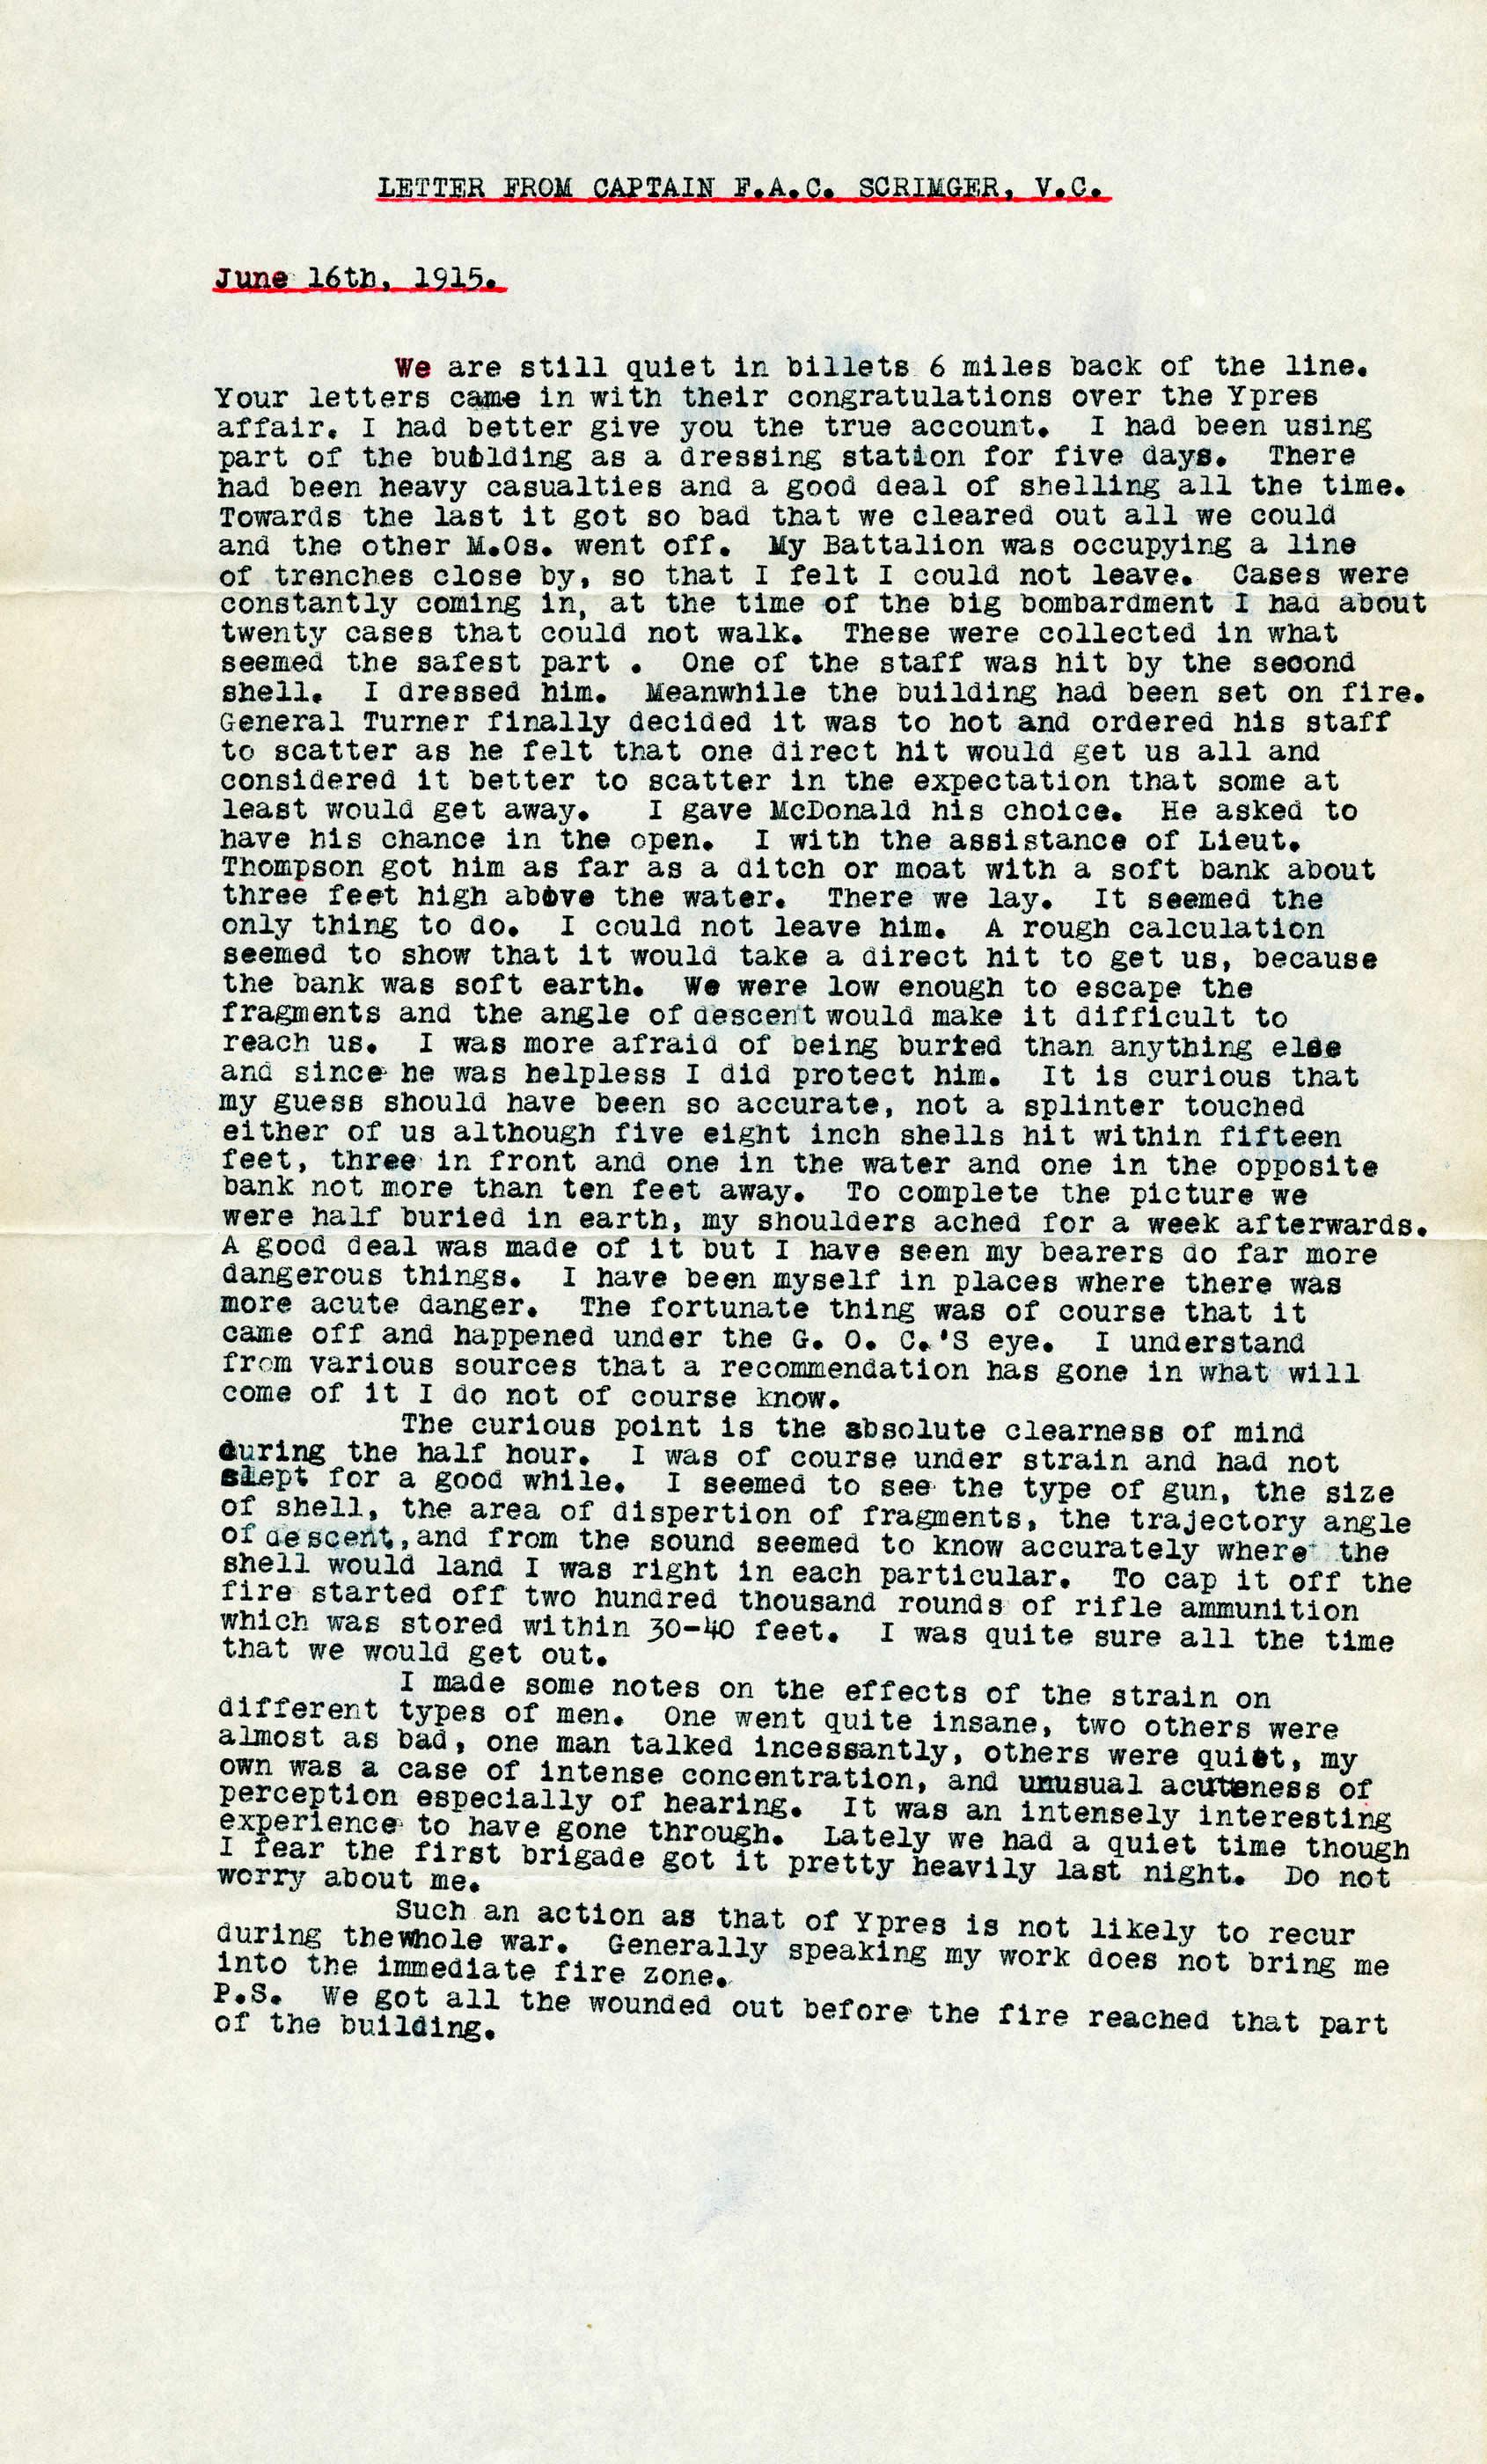 Lettre du capitaine F.A.C. Scrimger, V.C.